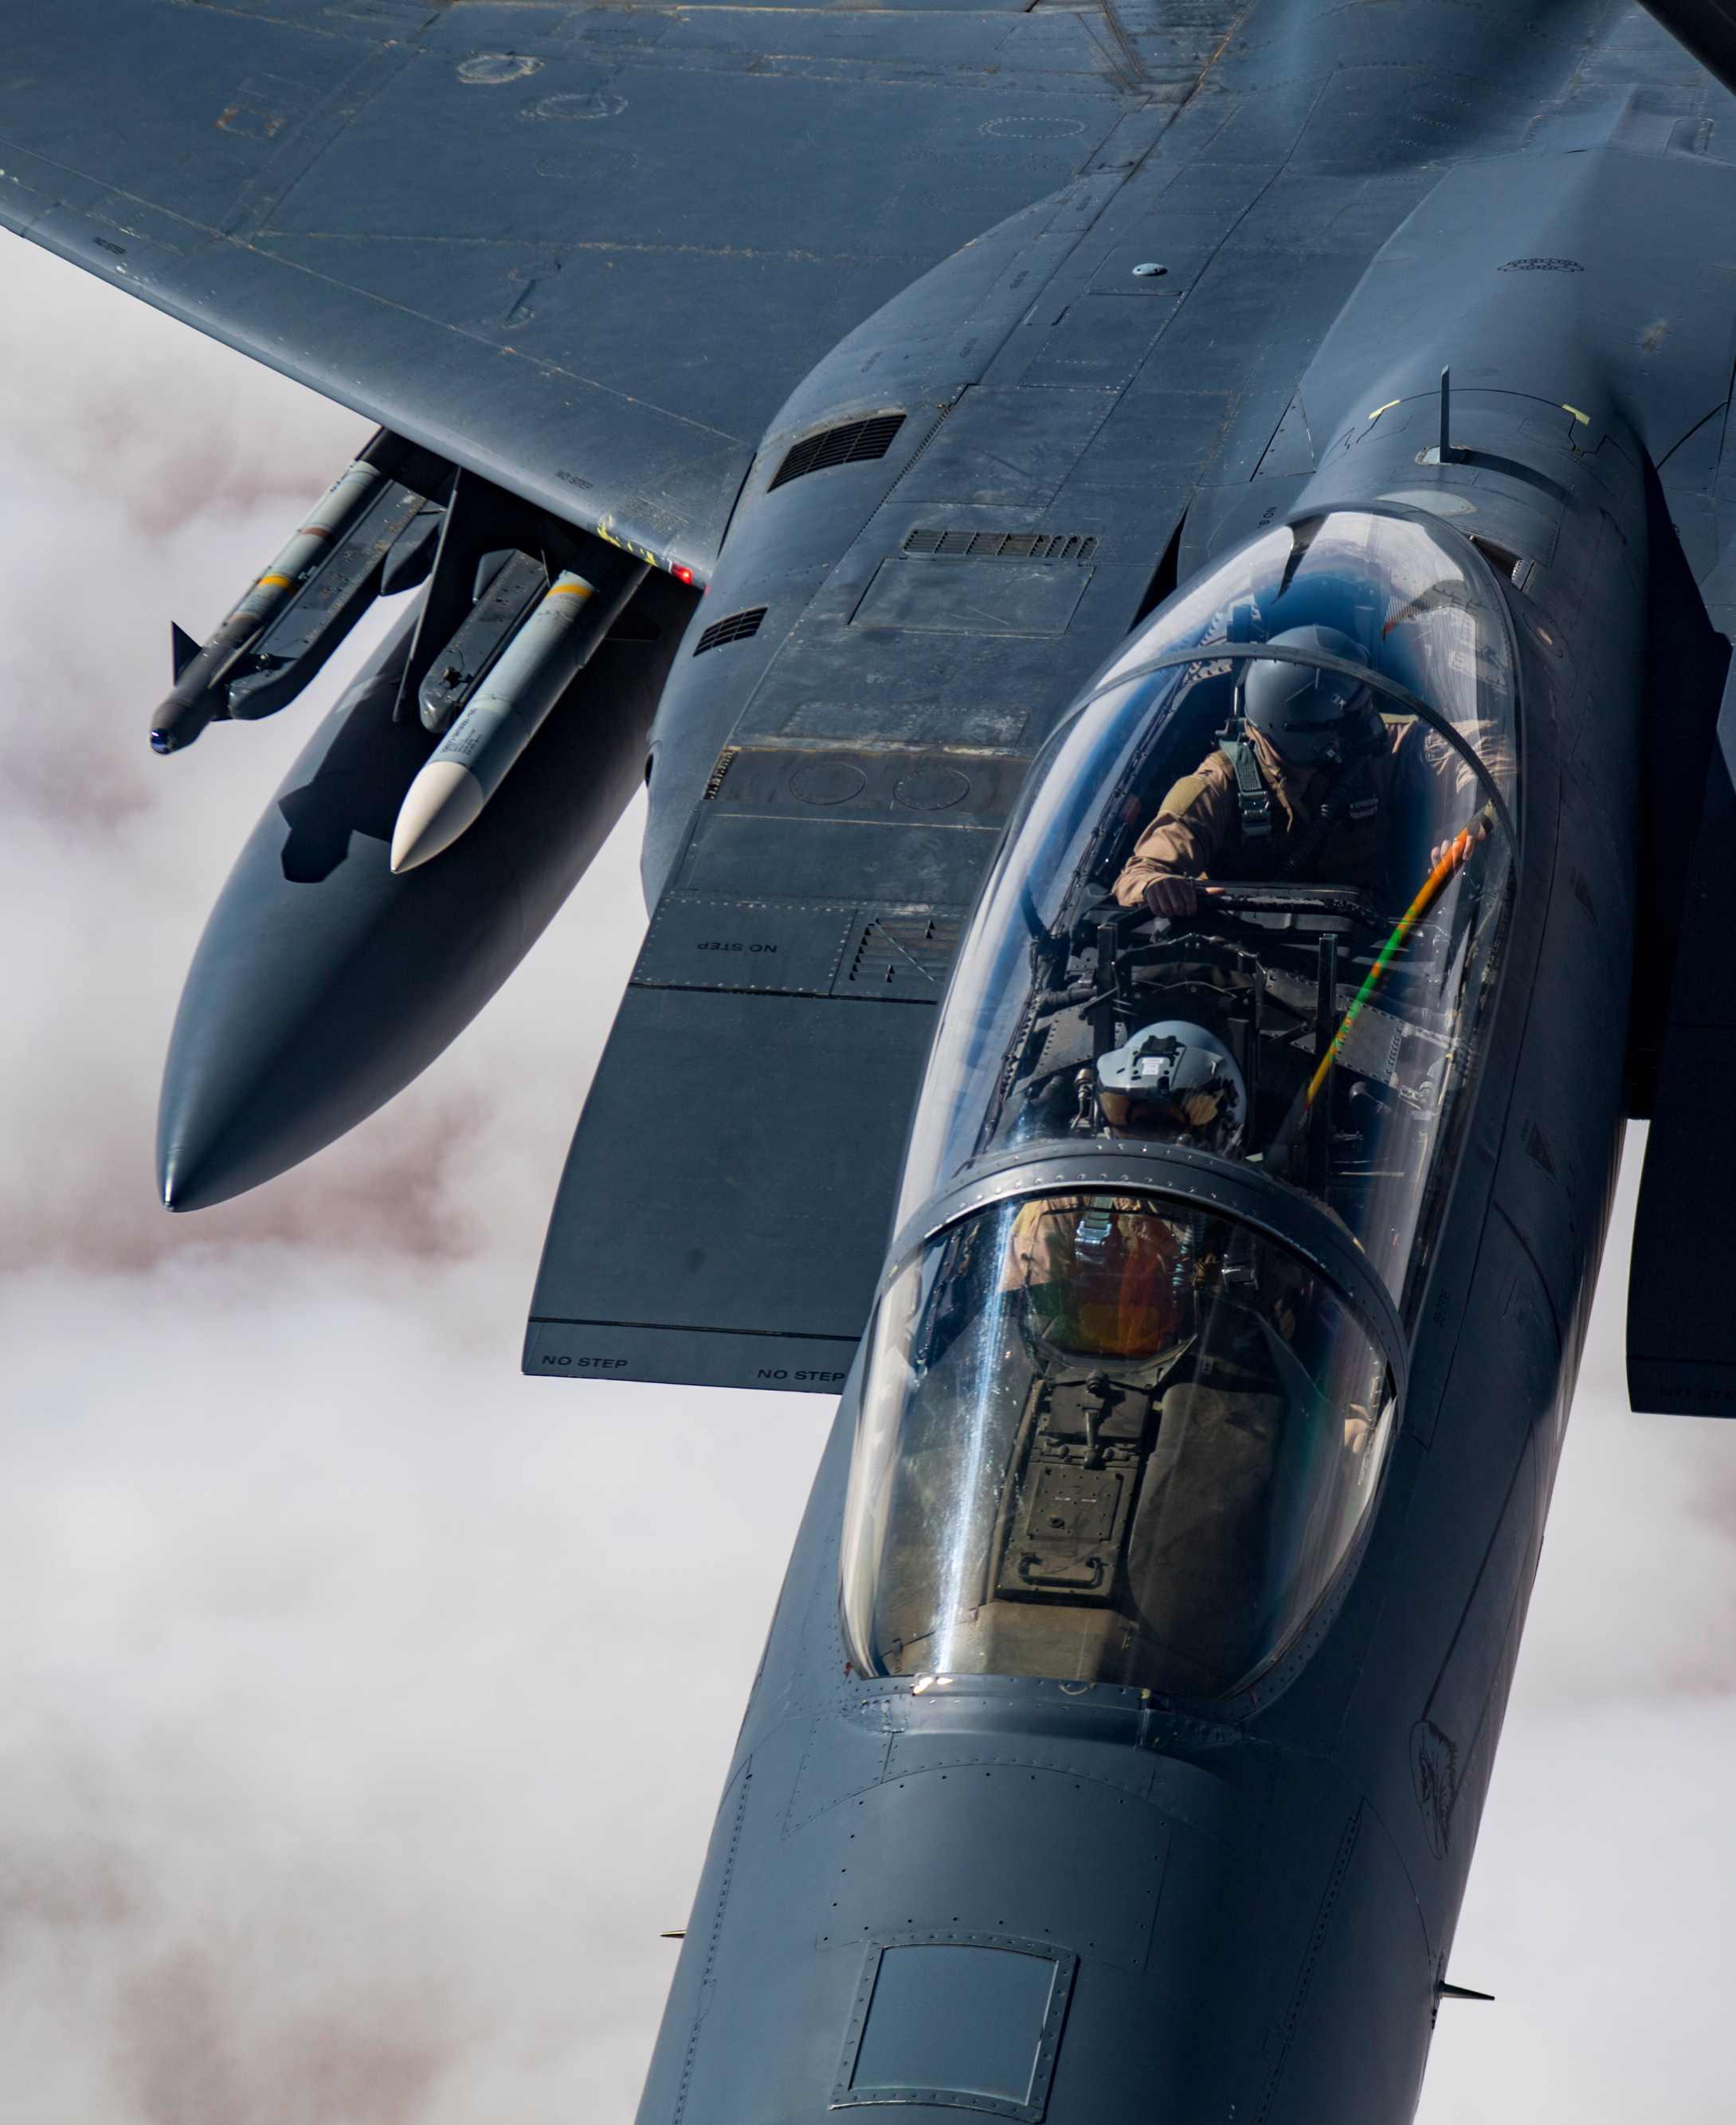 F-15 cockpit, F-15 facts